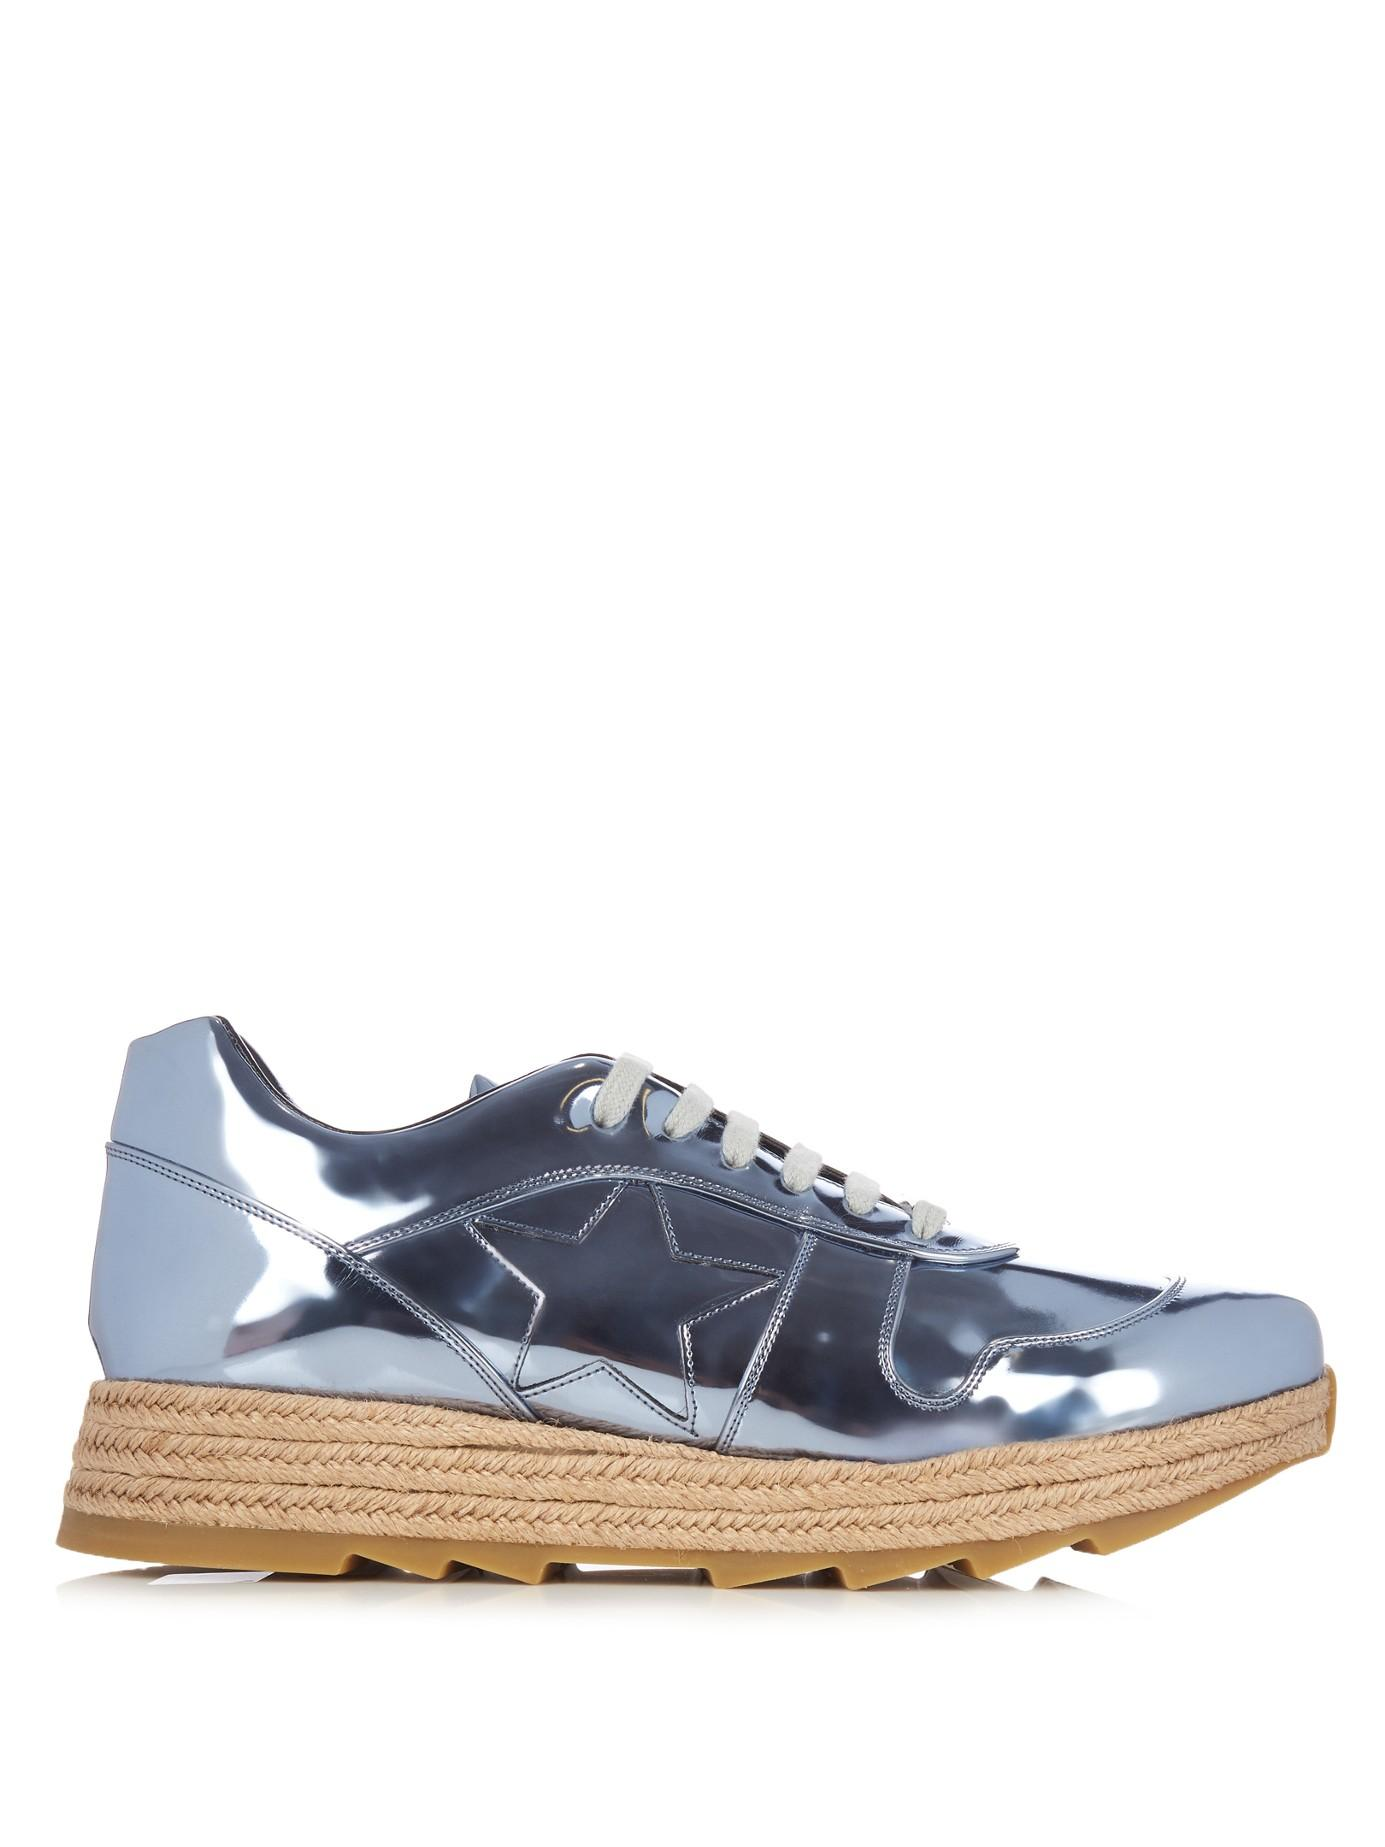 Adidas By Stella Mccartney Shoes Gold